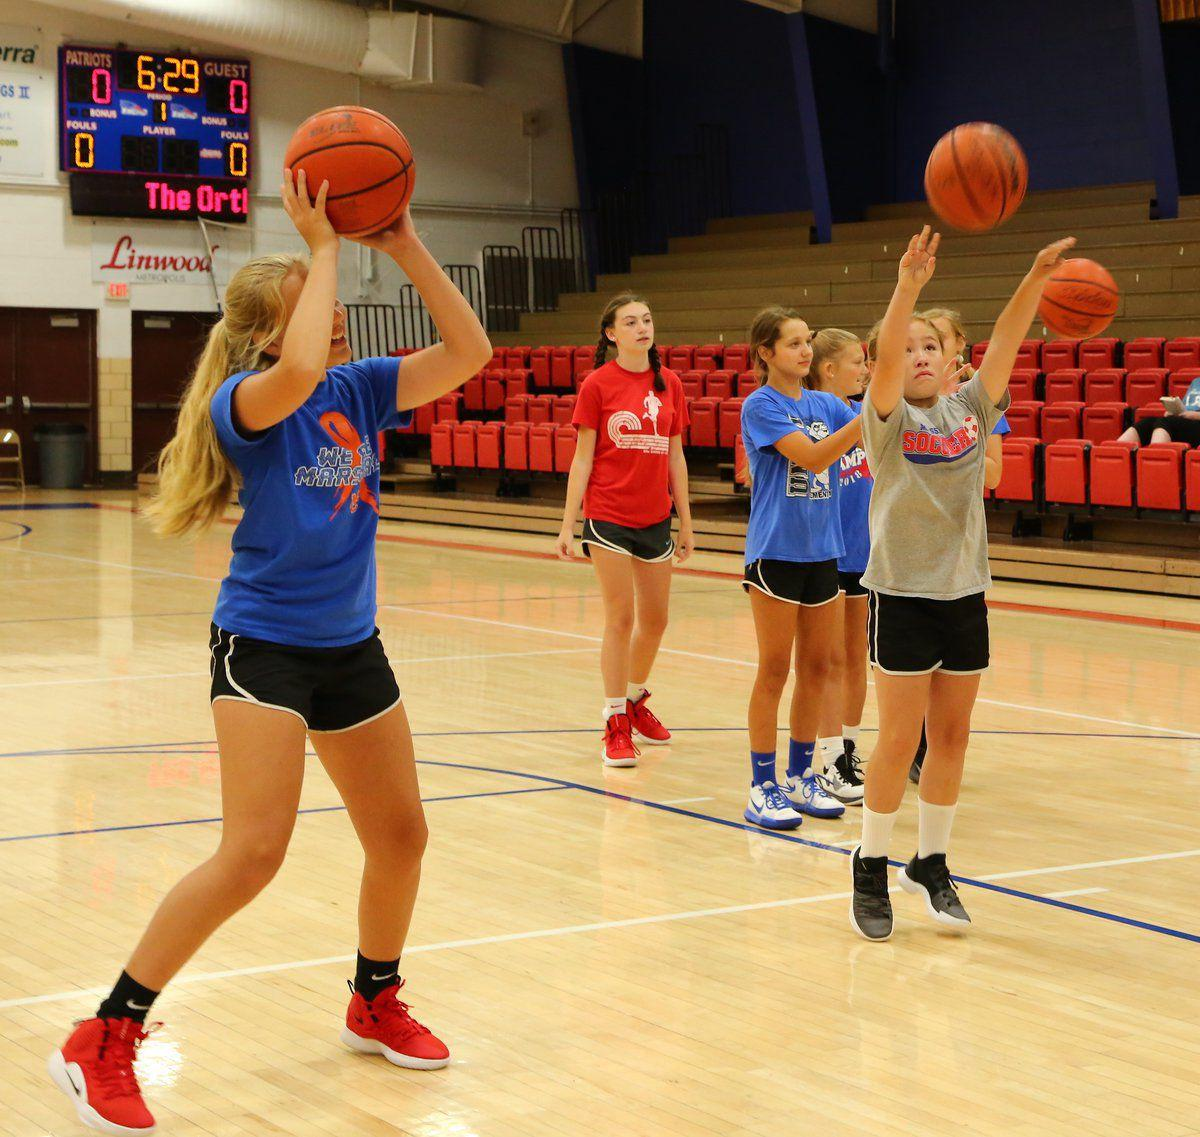 Lady Patriot Basketball Camp